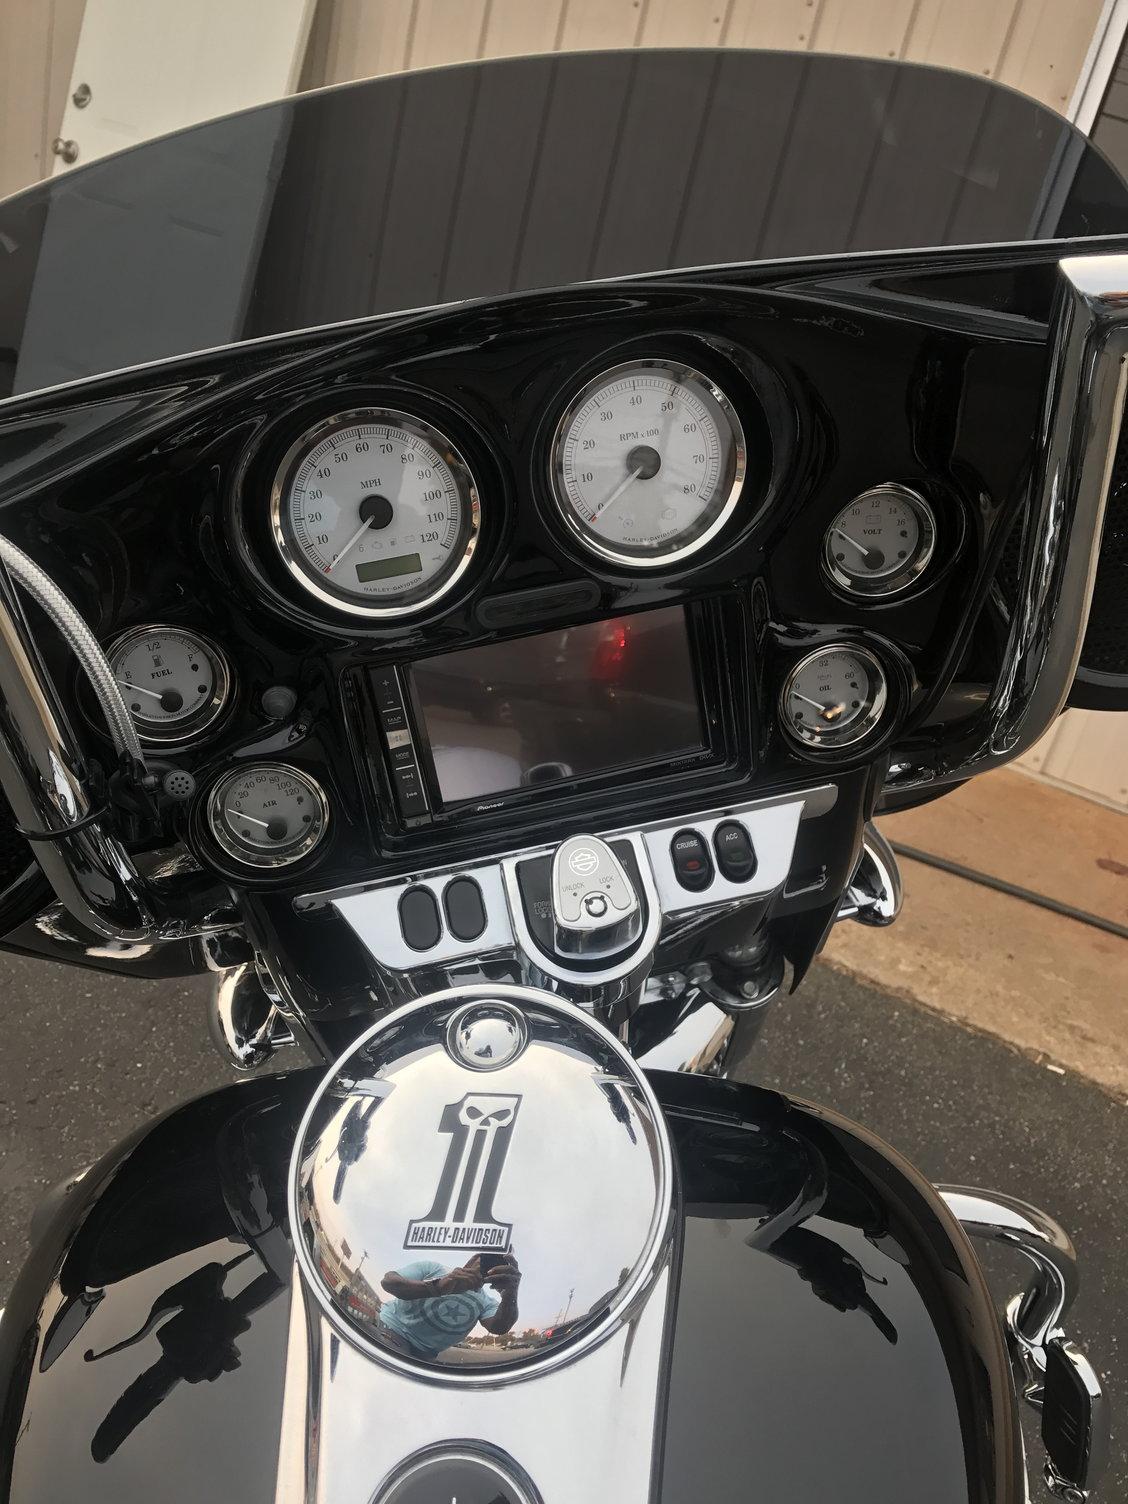 New Double Din Inner Fairing - Harley Davidson Forums